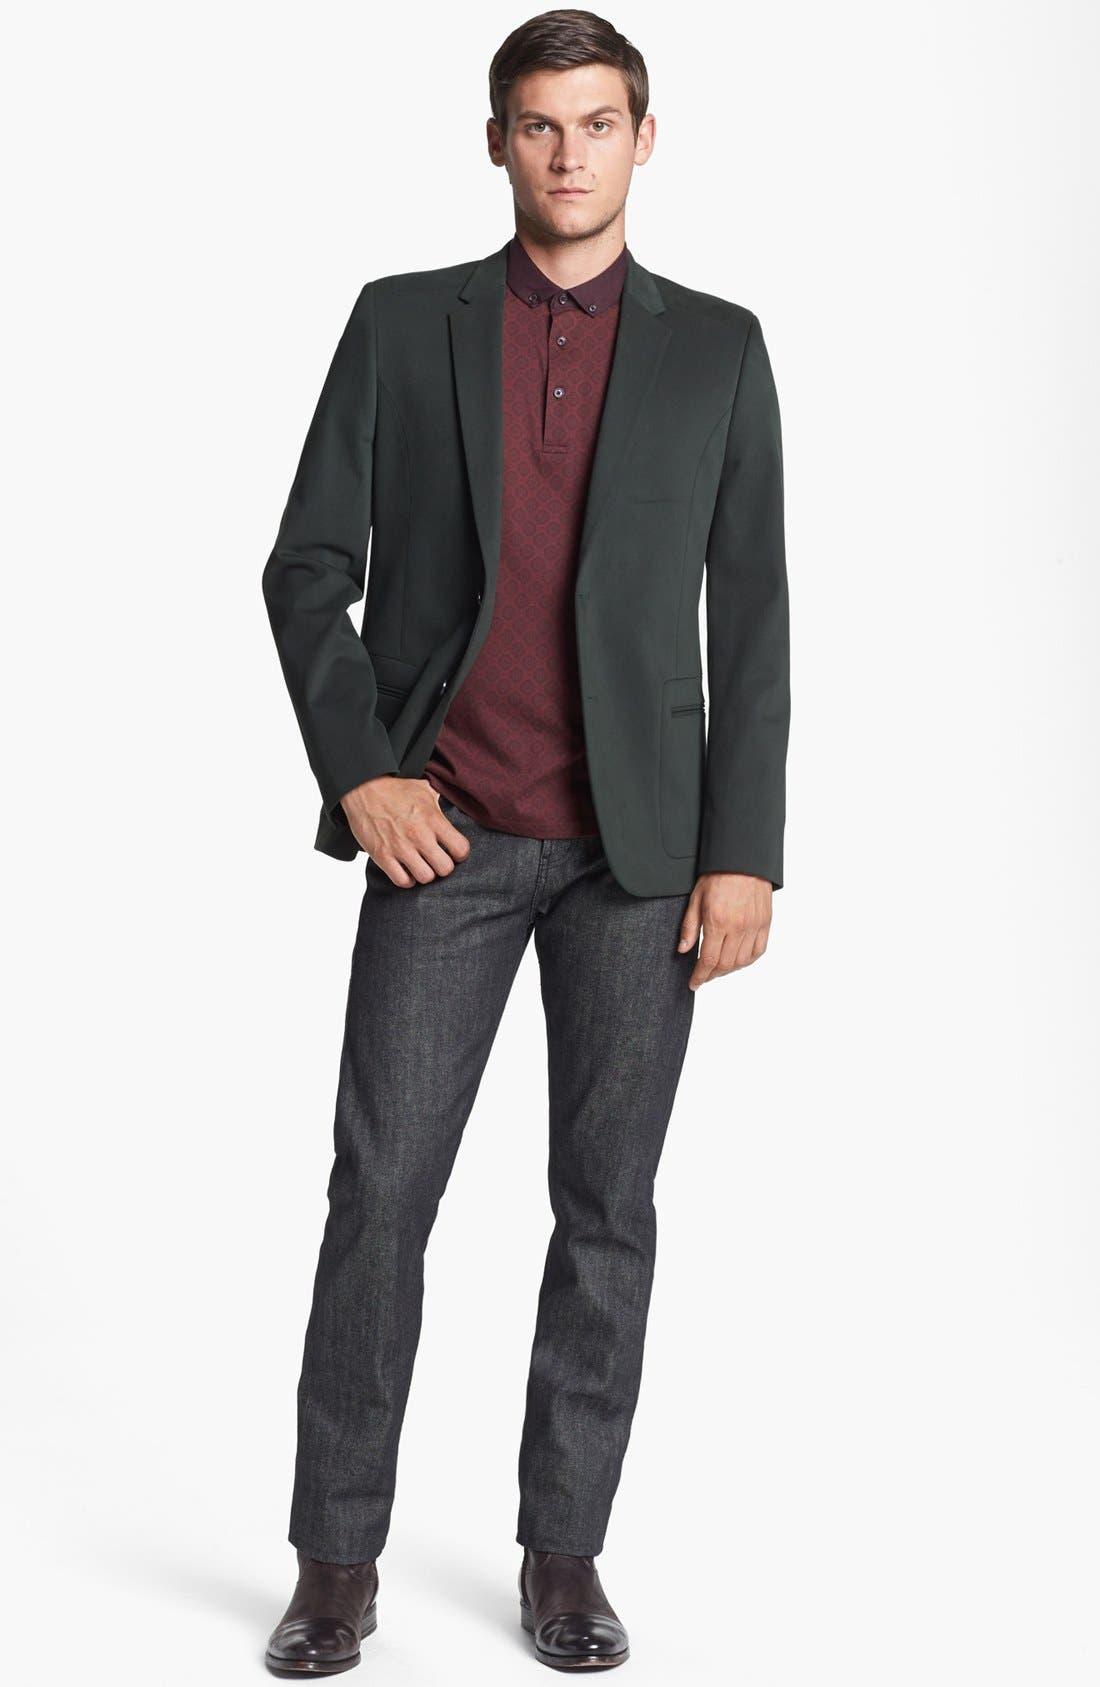 Main Image - HUGO Blazer & Levi's® Made & Crafted™ Jeans